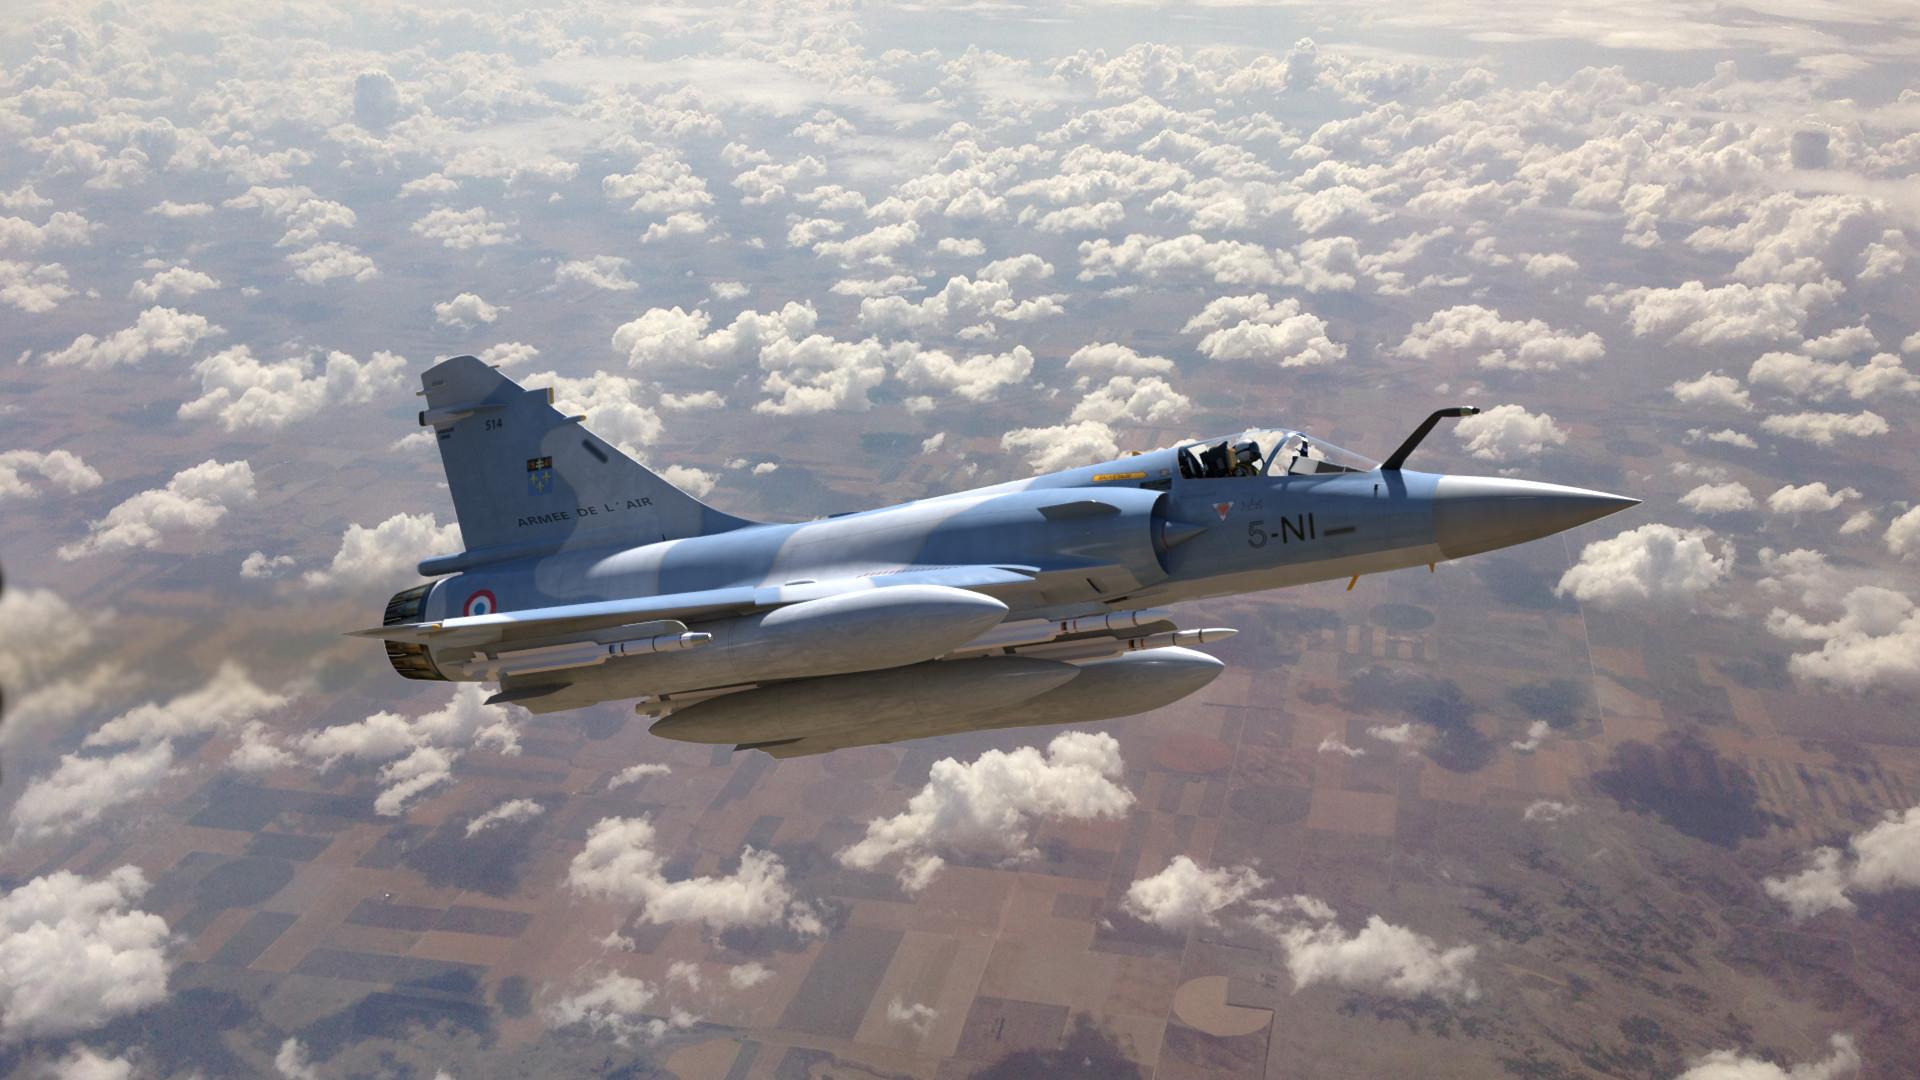 Mirage 2000 By Anton Swanepoel Imaginaryaviation